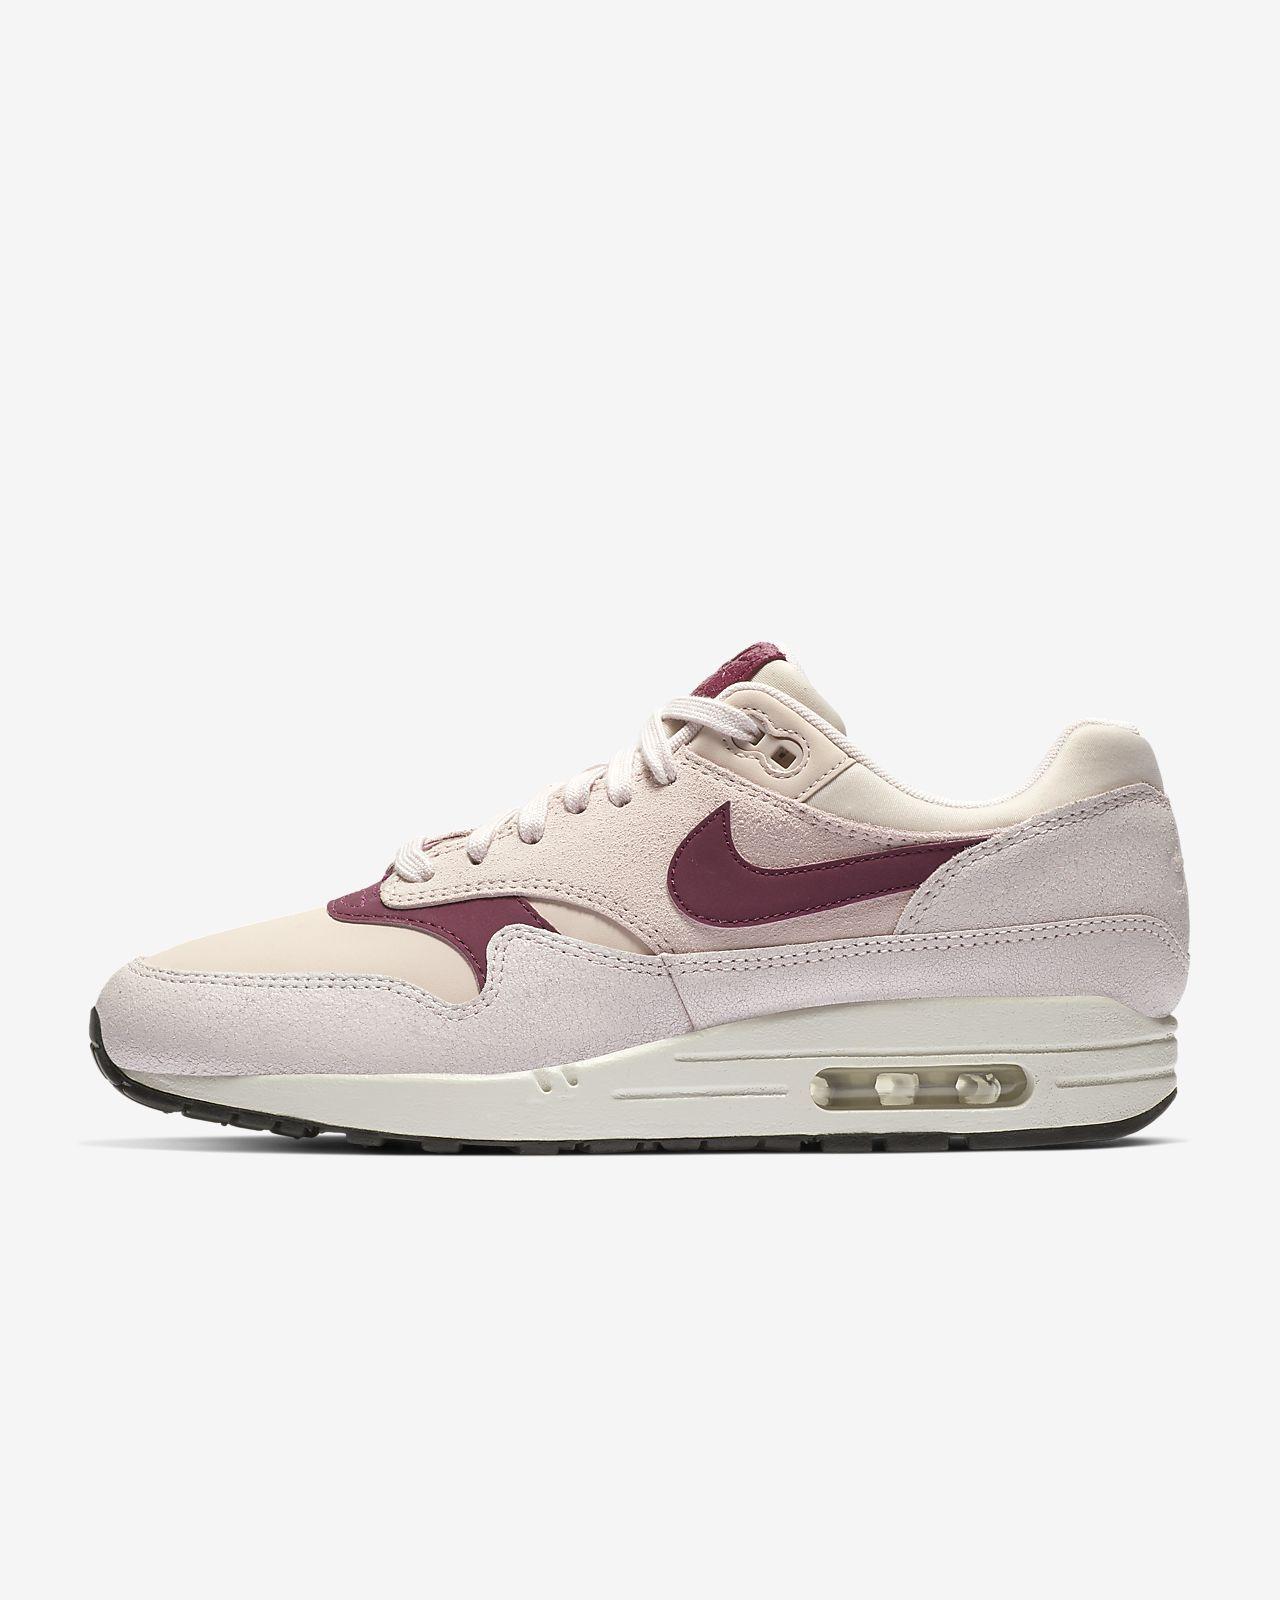 2994523db3e Sapatilhas Nike Air Max 1 Premium para mulher. Nike.com PT